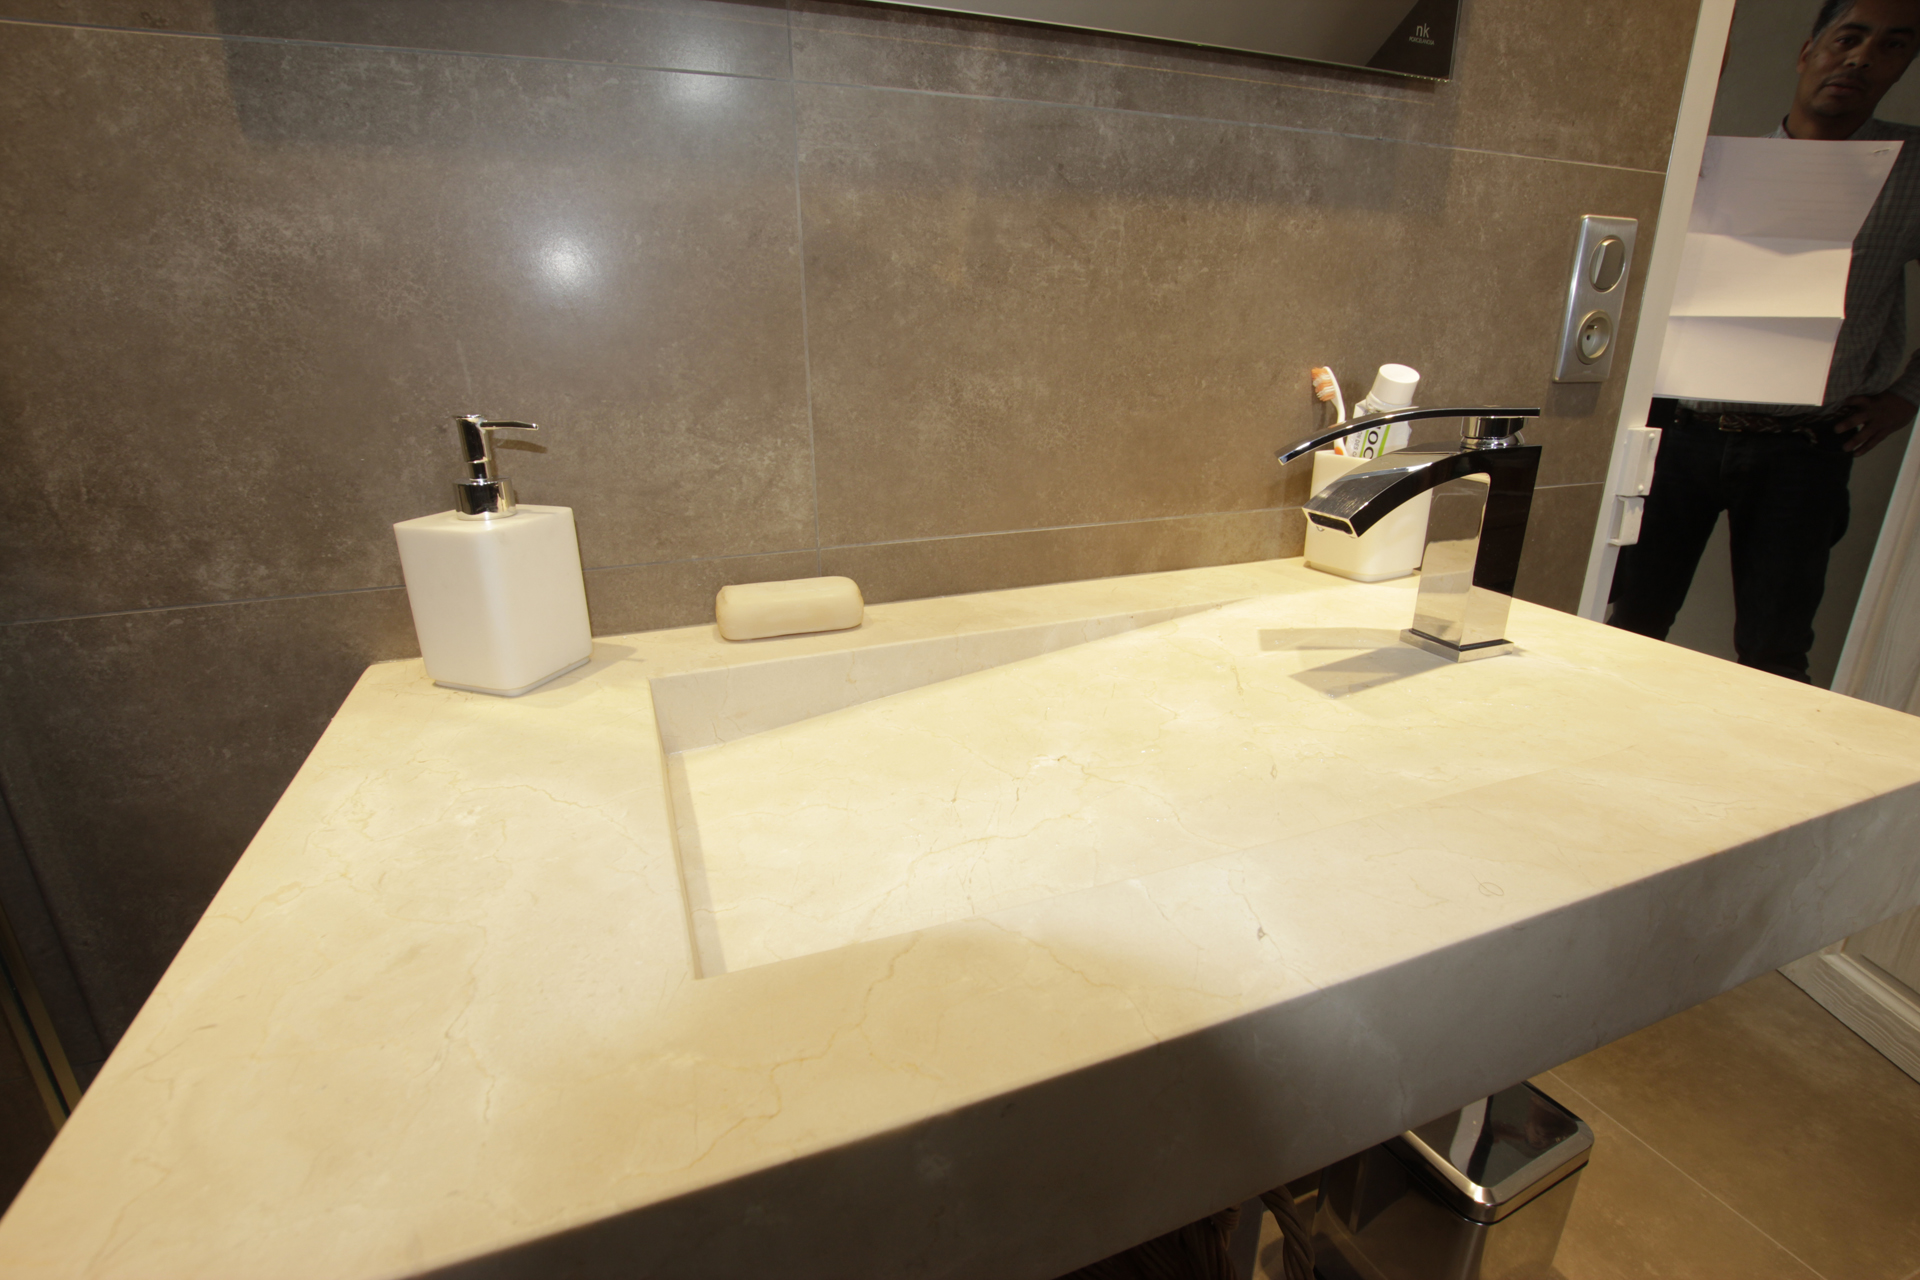 Lavabo porcelanosa noken jou plomberie chauffage for Plomberie lavabo salle de bain